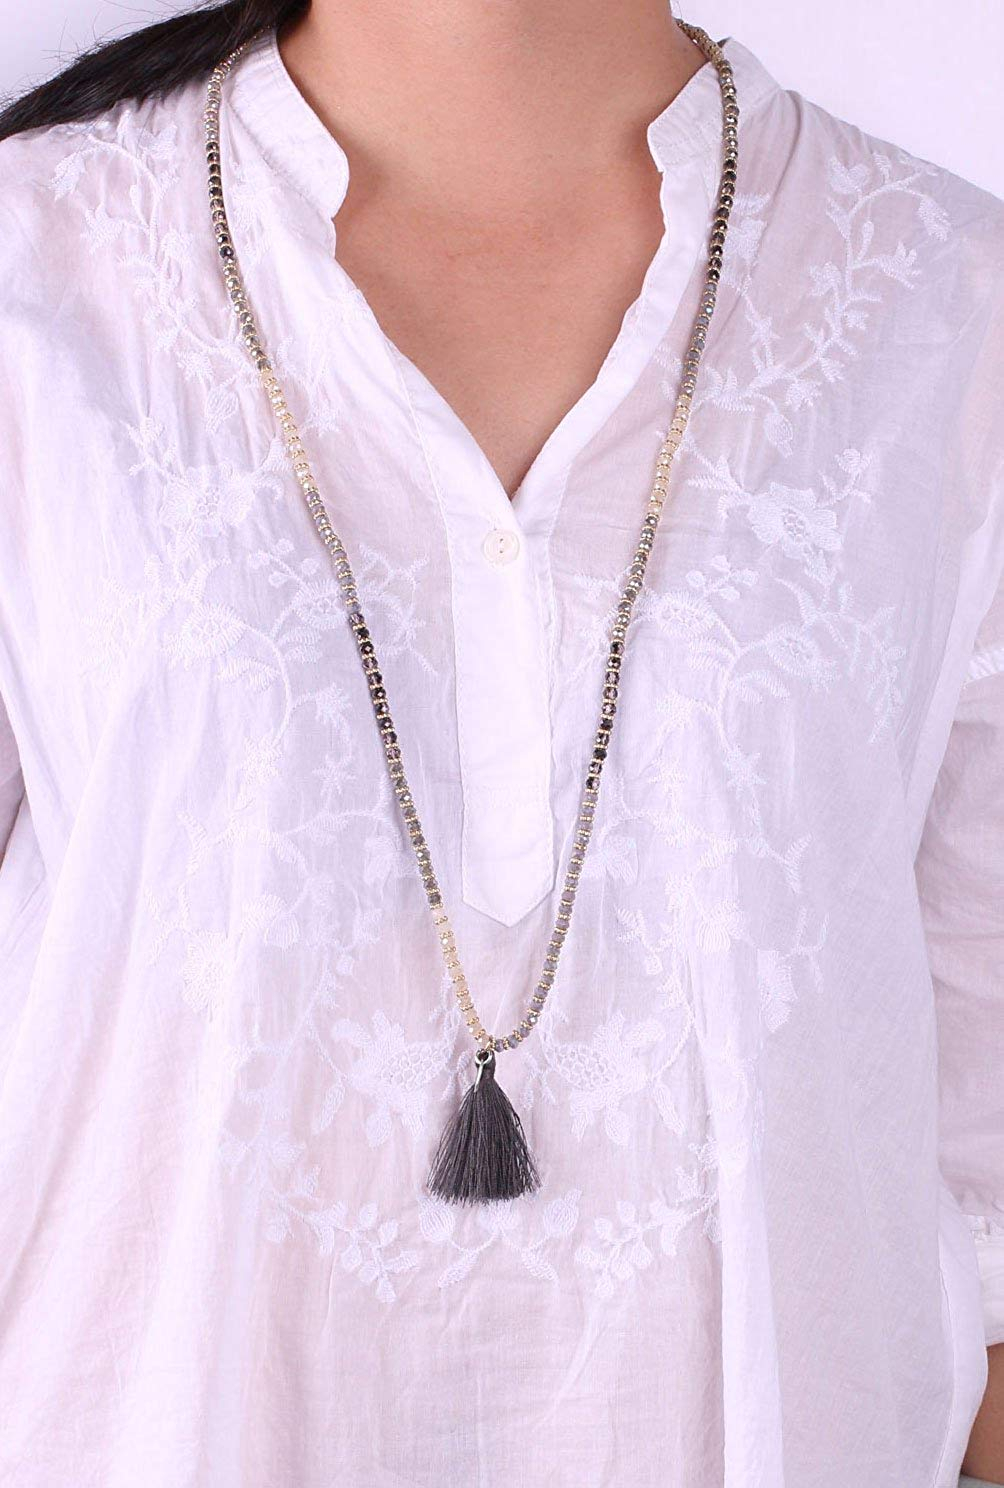 KELITCH Crysta AB Beaded Long Necklace Color Tassel Pendant Women Strand Bracele